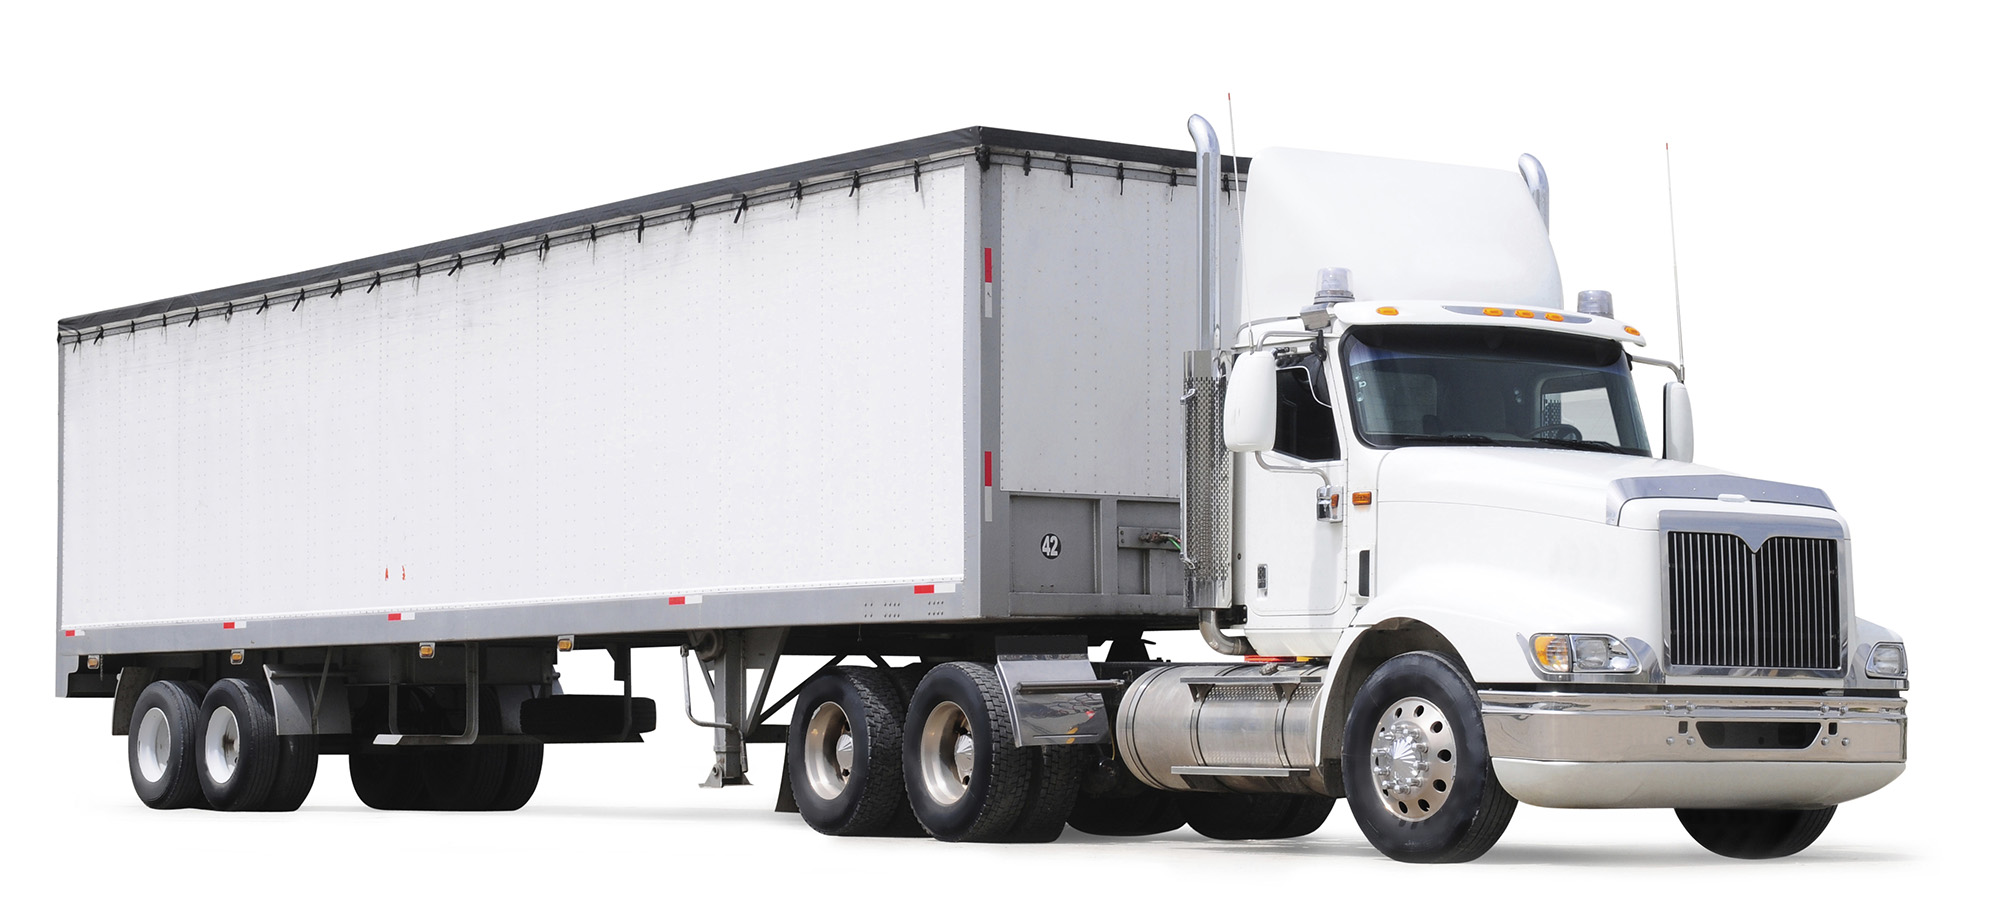 Truck HD PNG - 95723